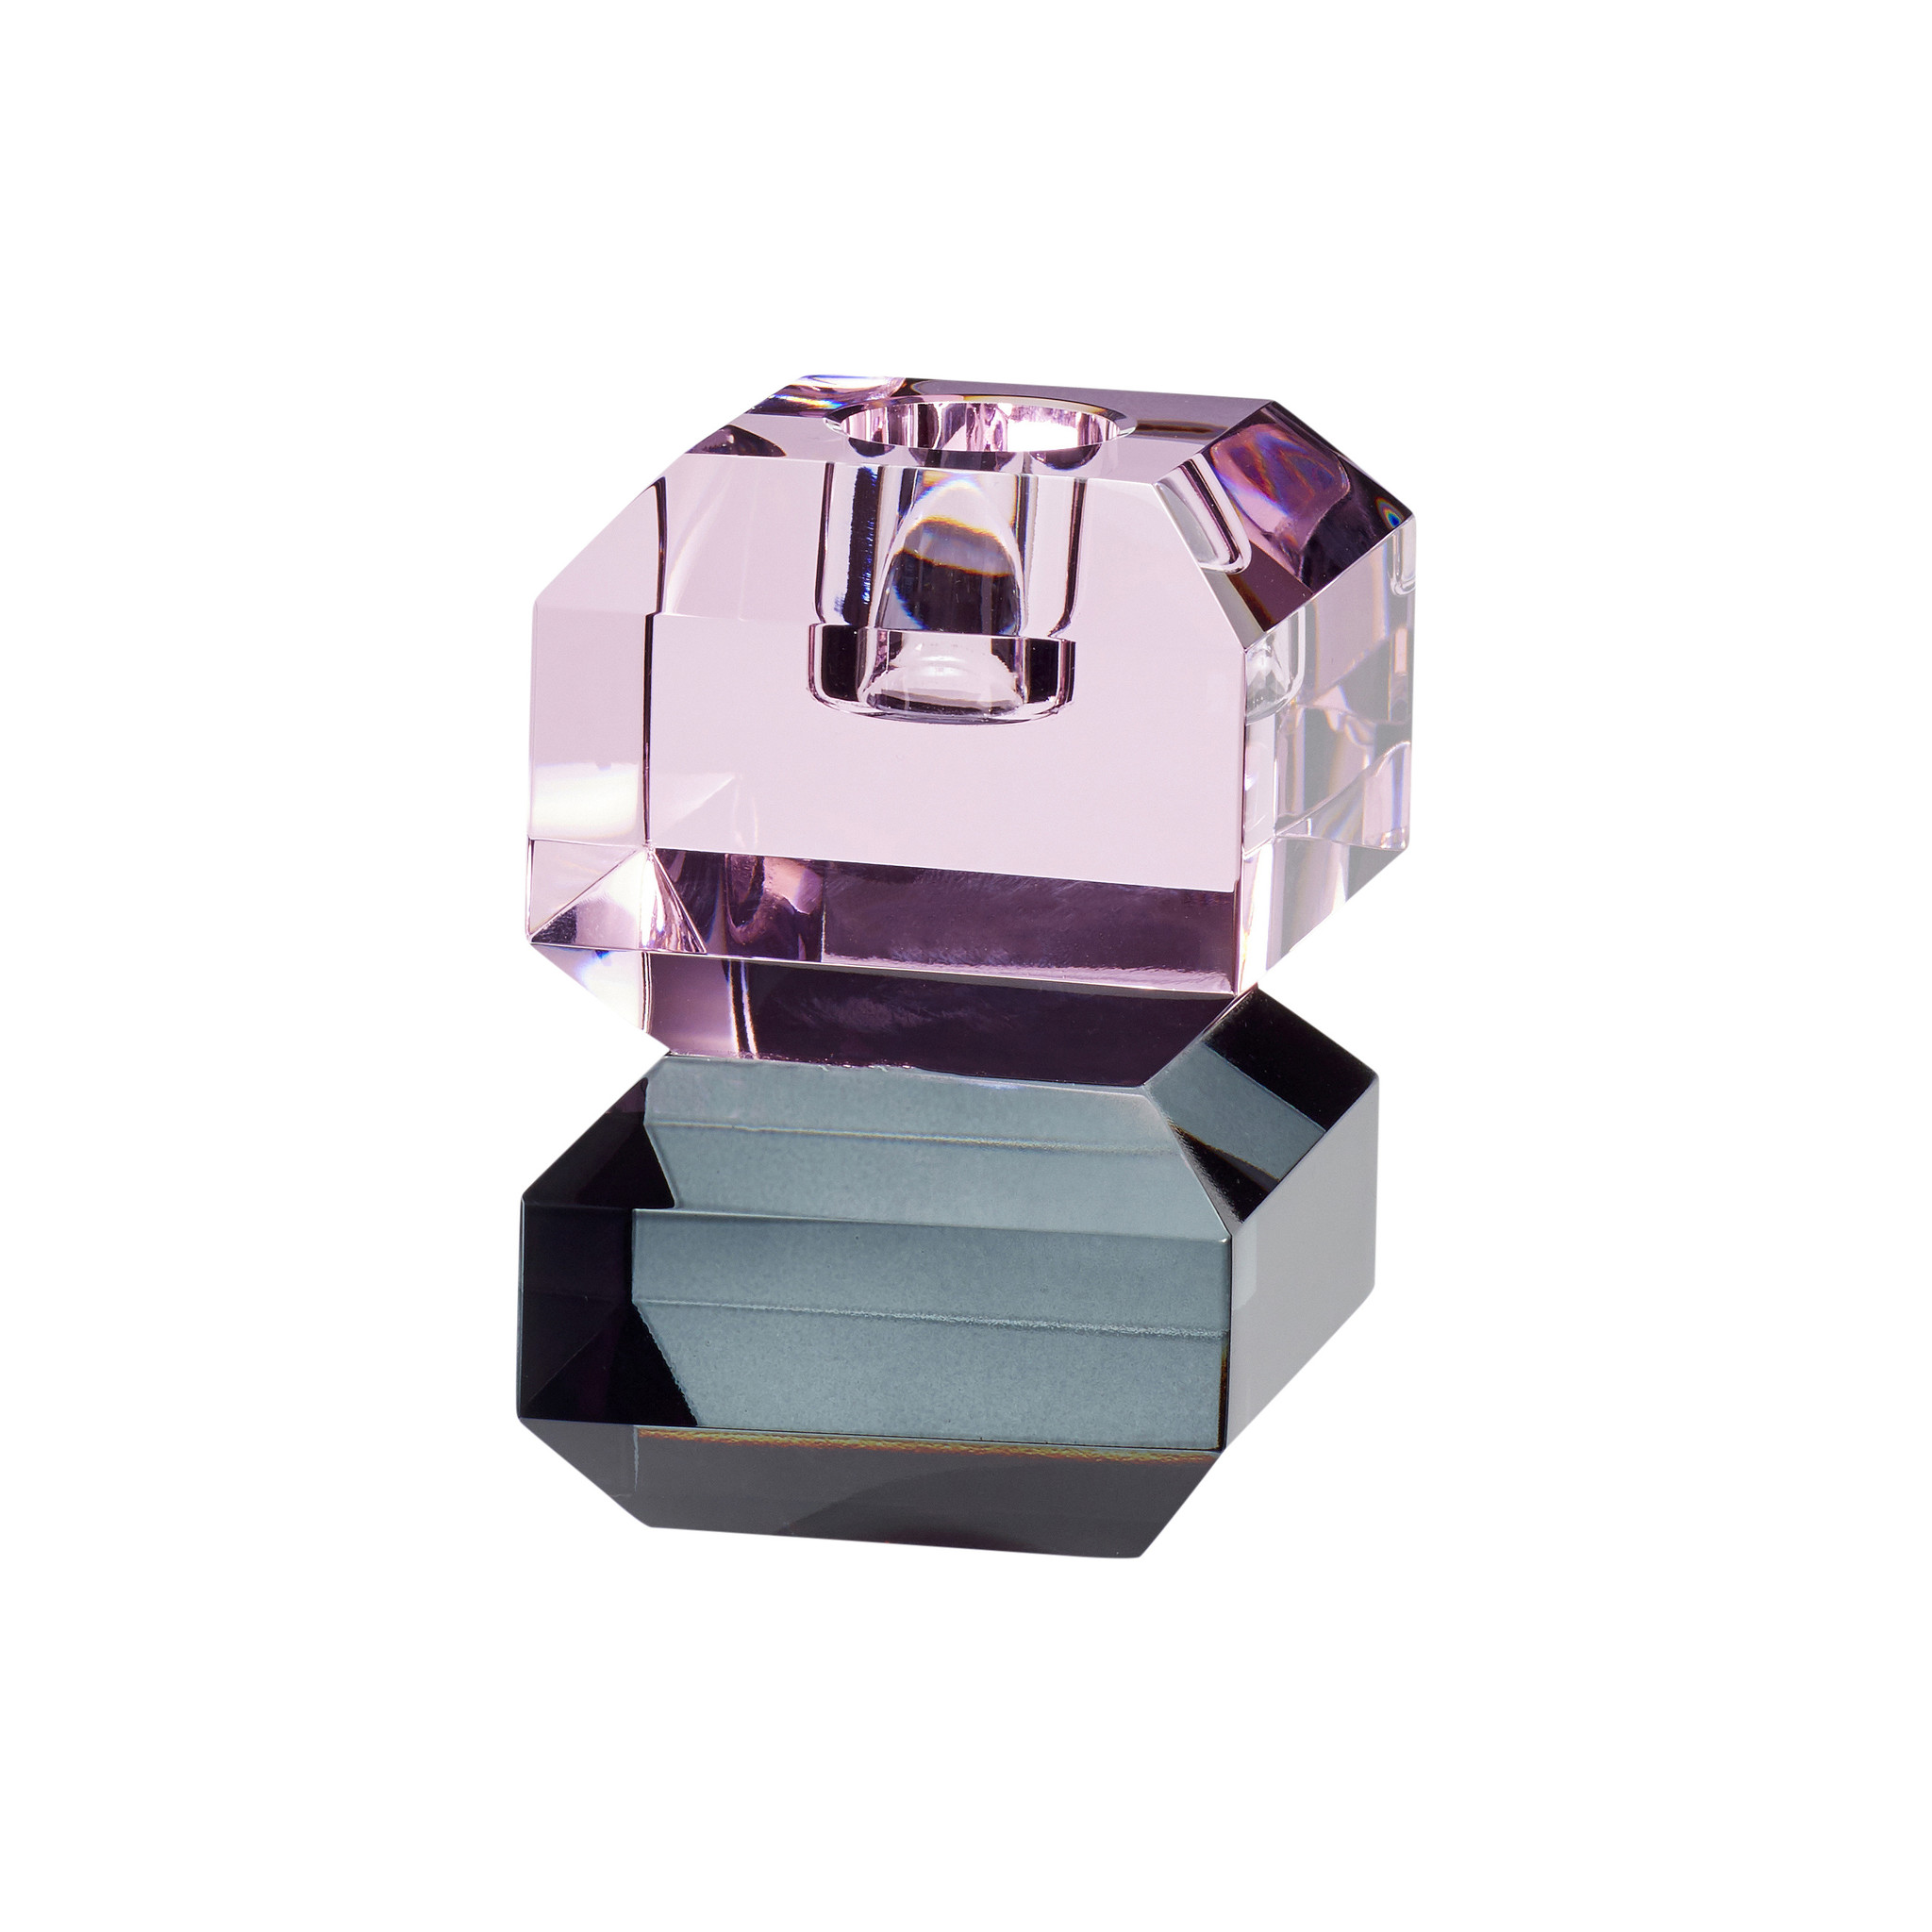 Hubsch Kandelaar, glas, roze / gerookt-340701-5712772060957